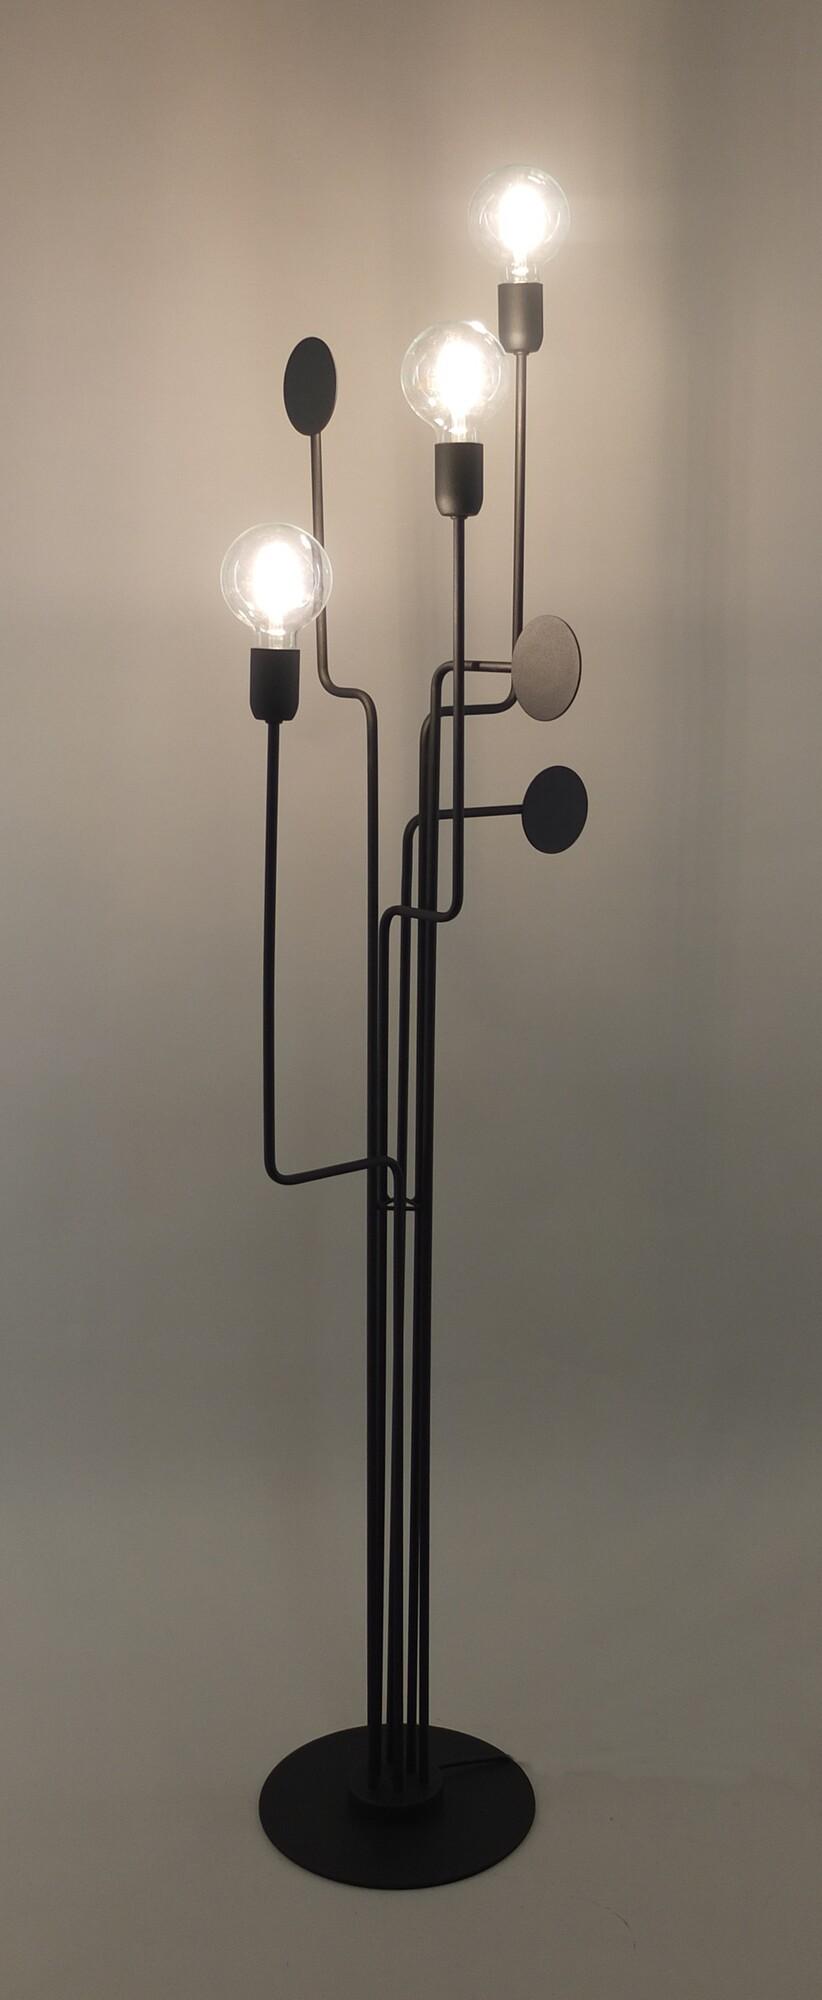 CIRCUIT Vloerlamp E27 3x Zwart